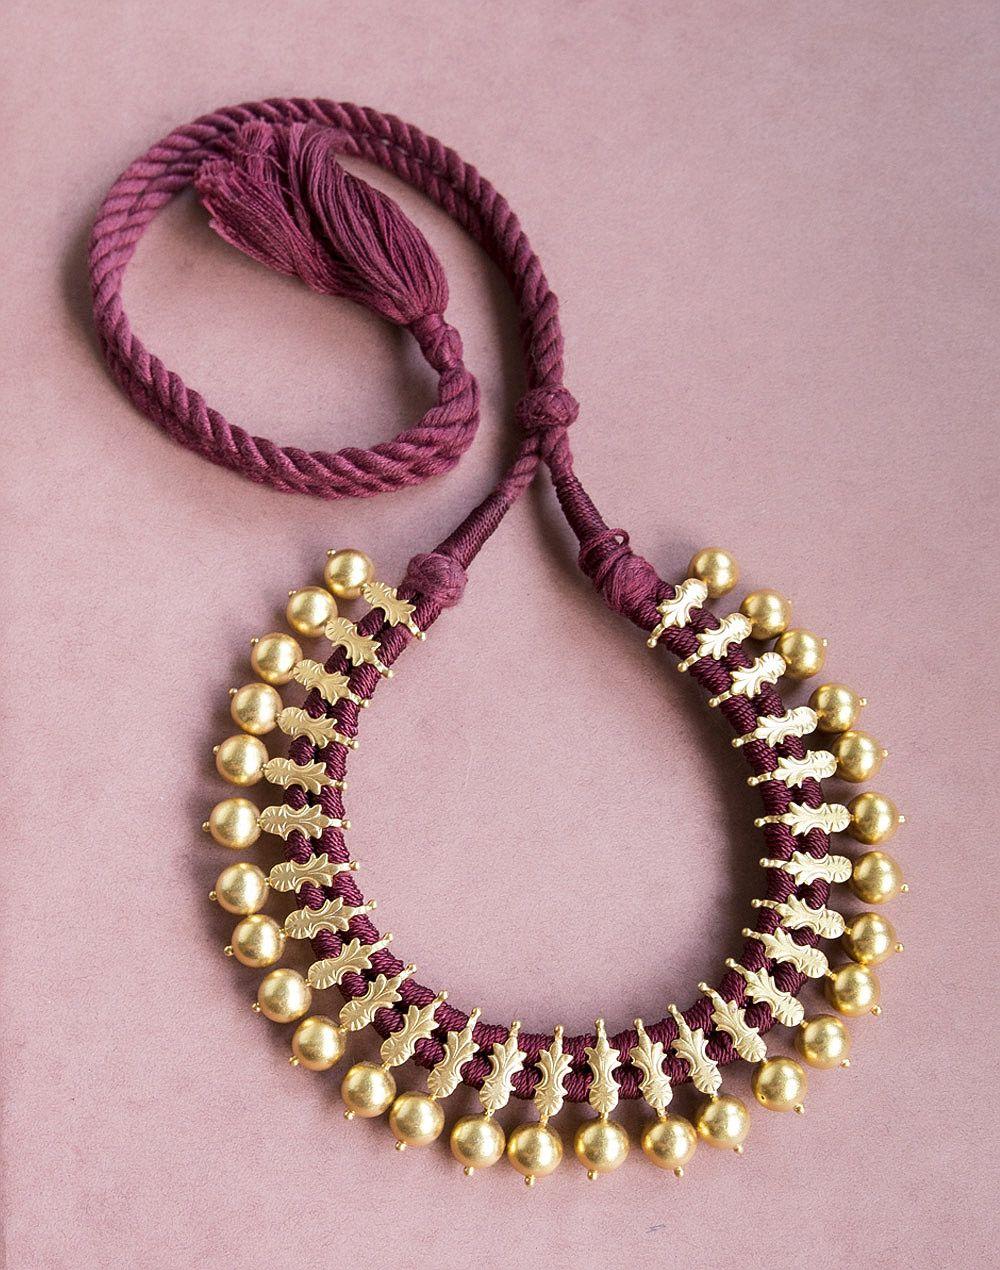 Silver Anusuya Choker Necklace. Free Shipping Worldwide. Explore ...